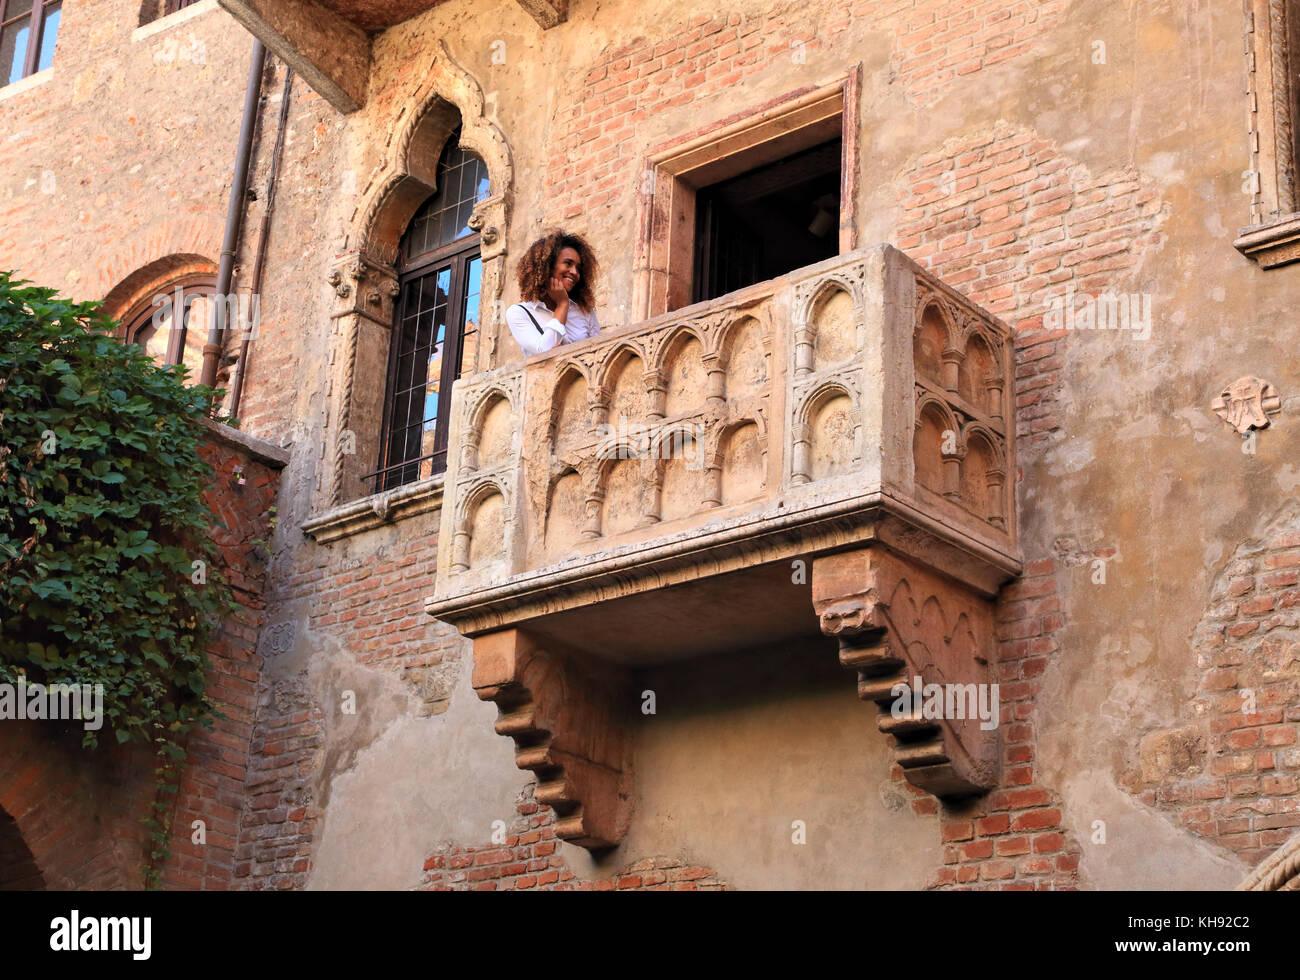 Julias Balkon.Haus von Romeo und Julia, Verona Stockbild